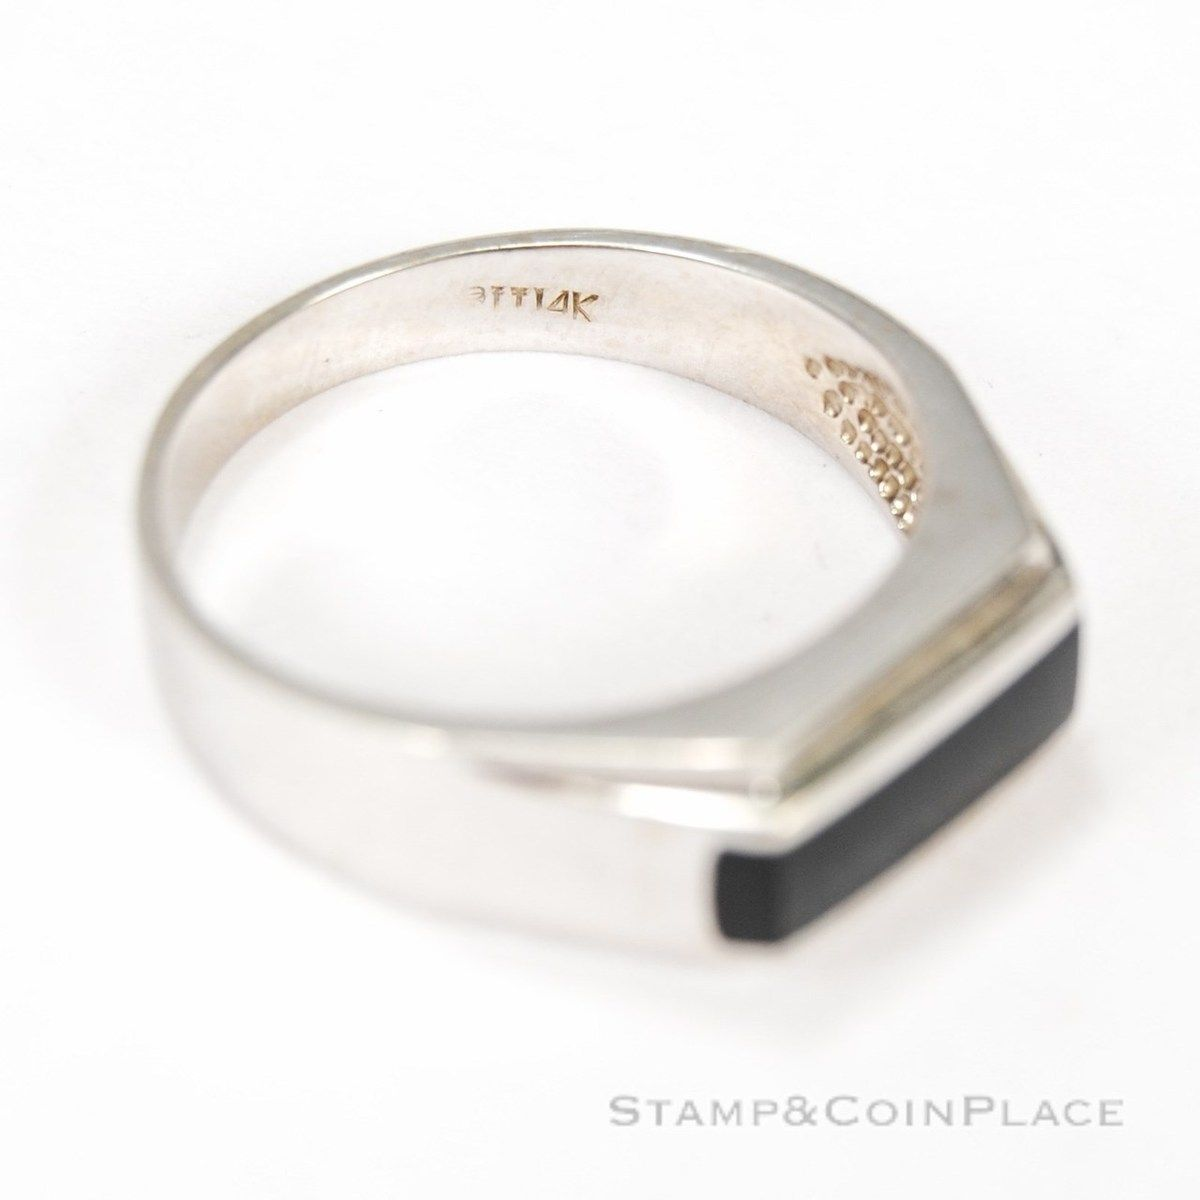 14K Gold Stamp Ring Jewelry Marking Stamping Tool